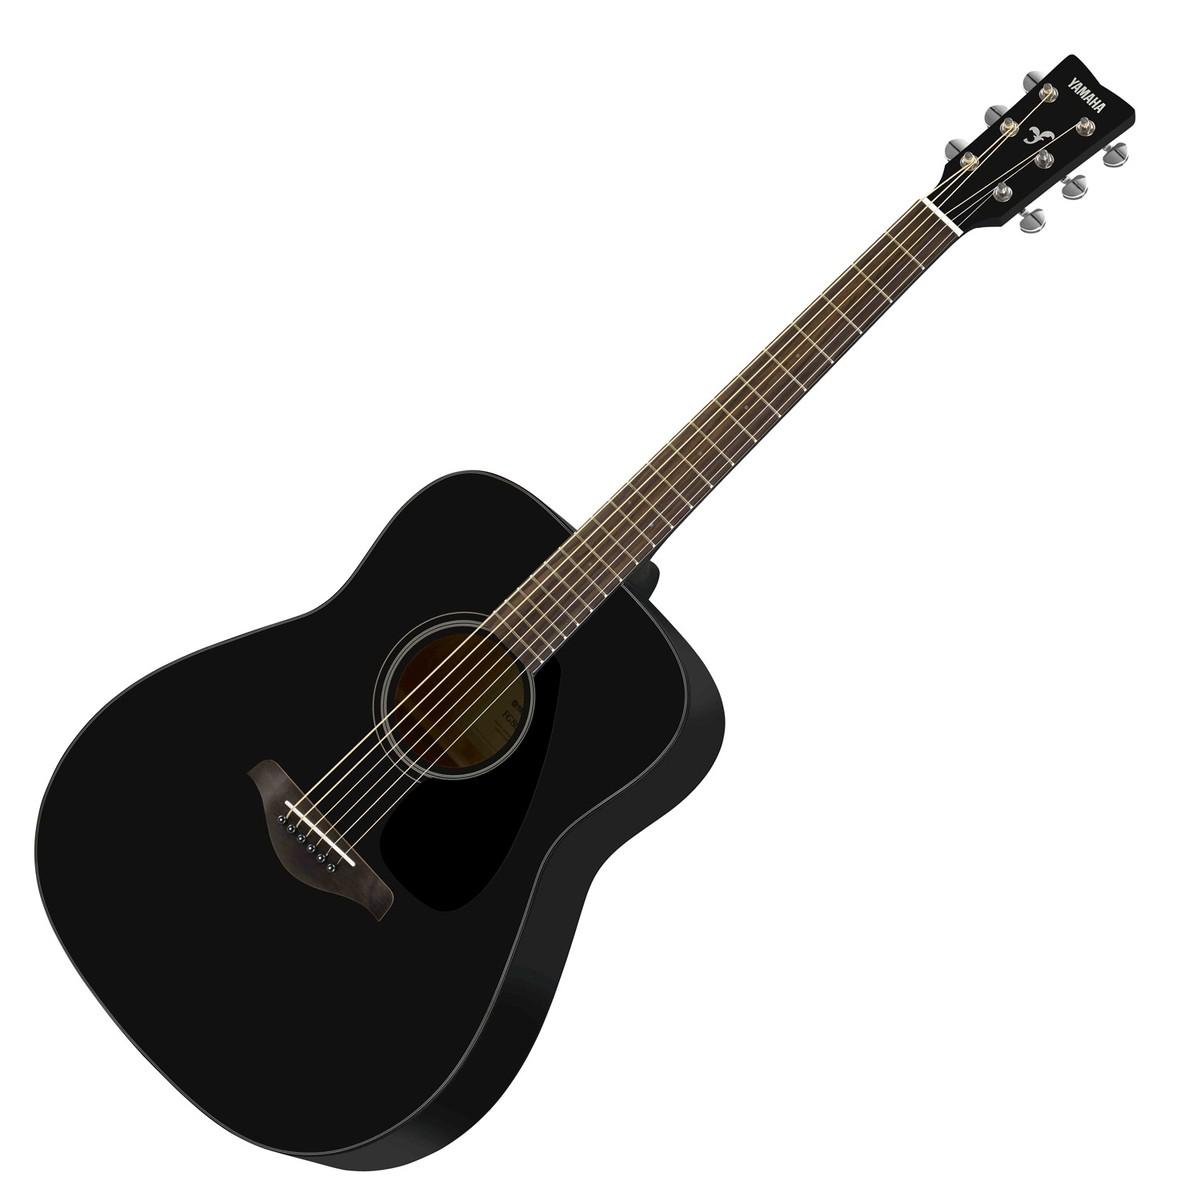 Yamaha Fg S Acoustic Guitar Black